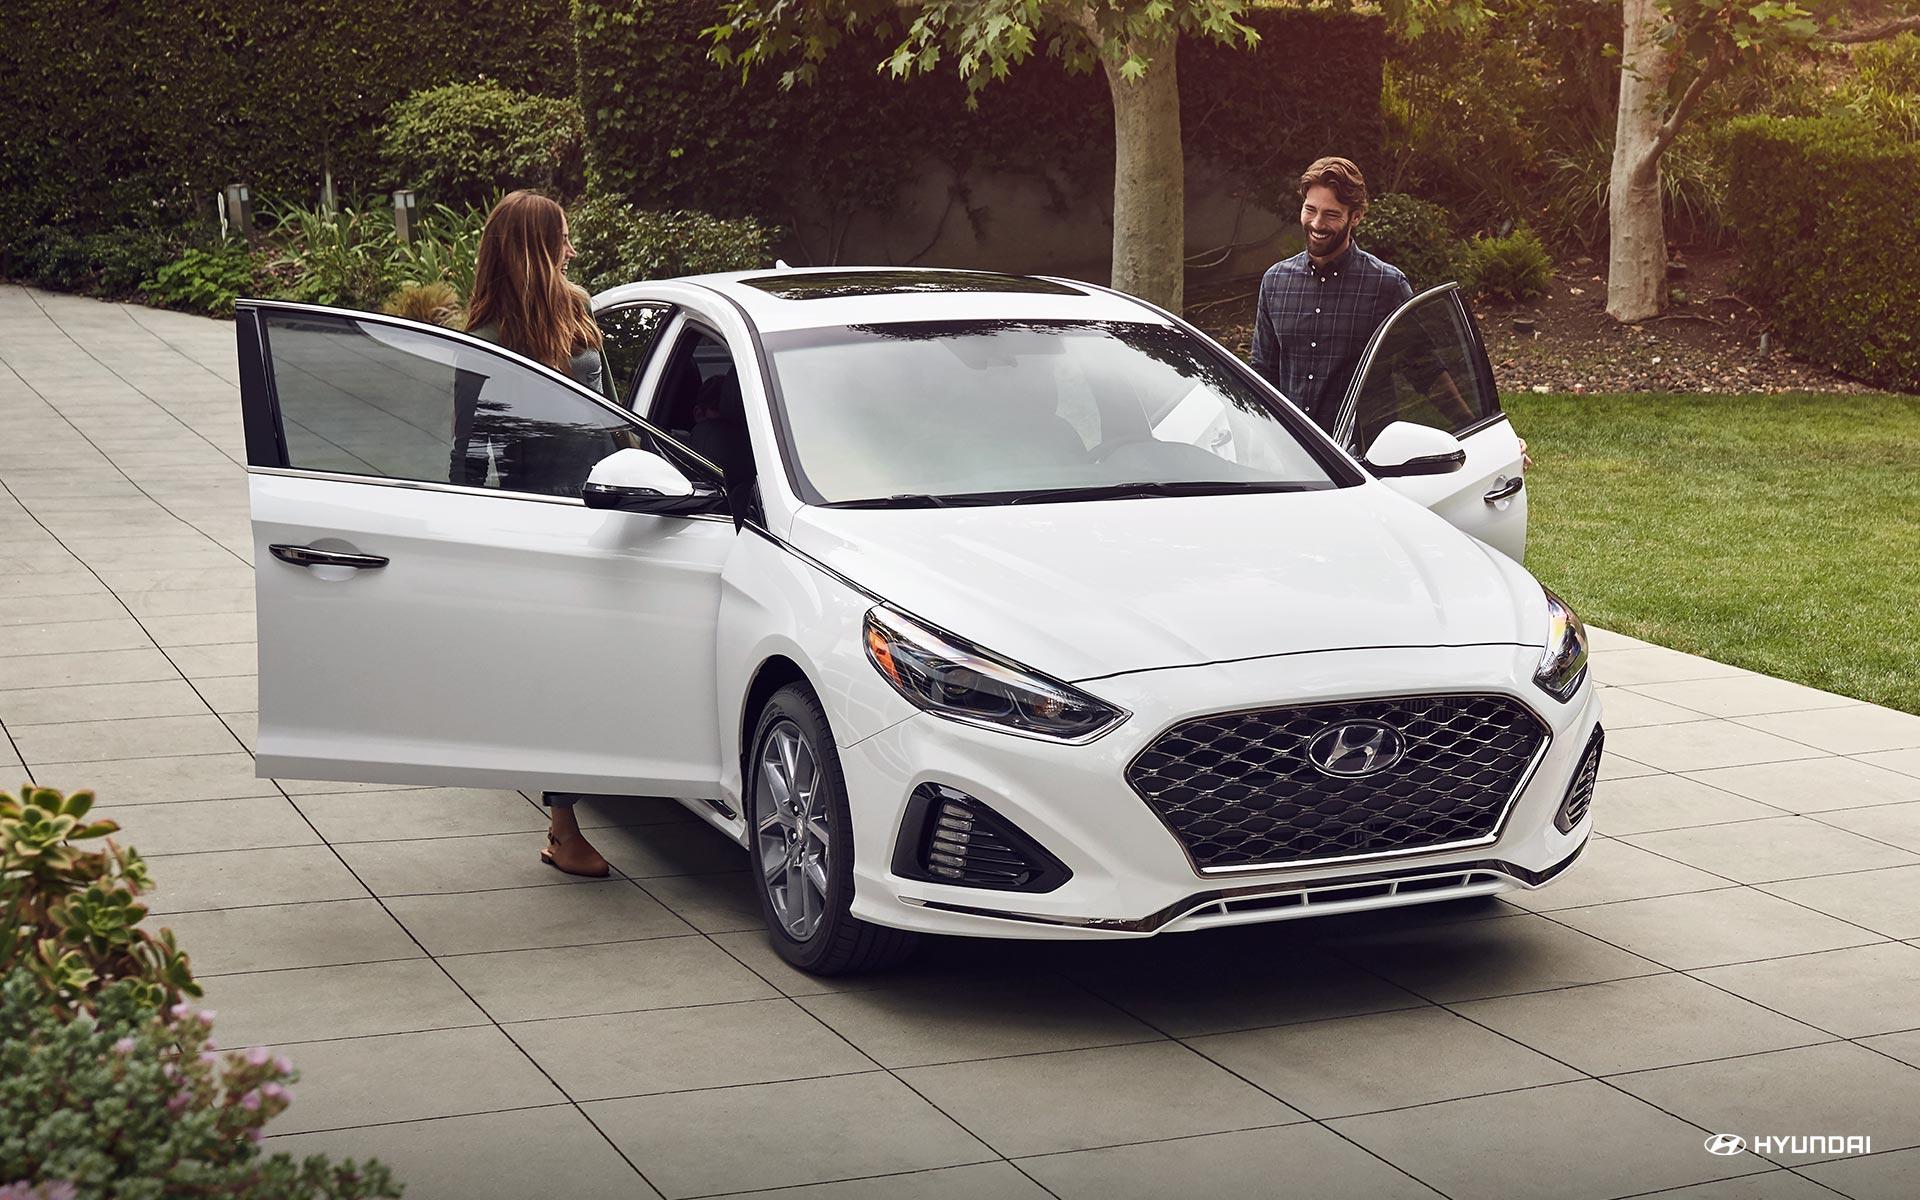 2019 Hyundai Sonata Leasing near Springfield, VA